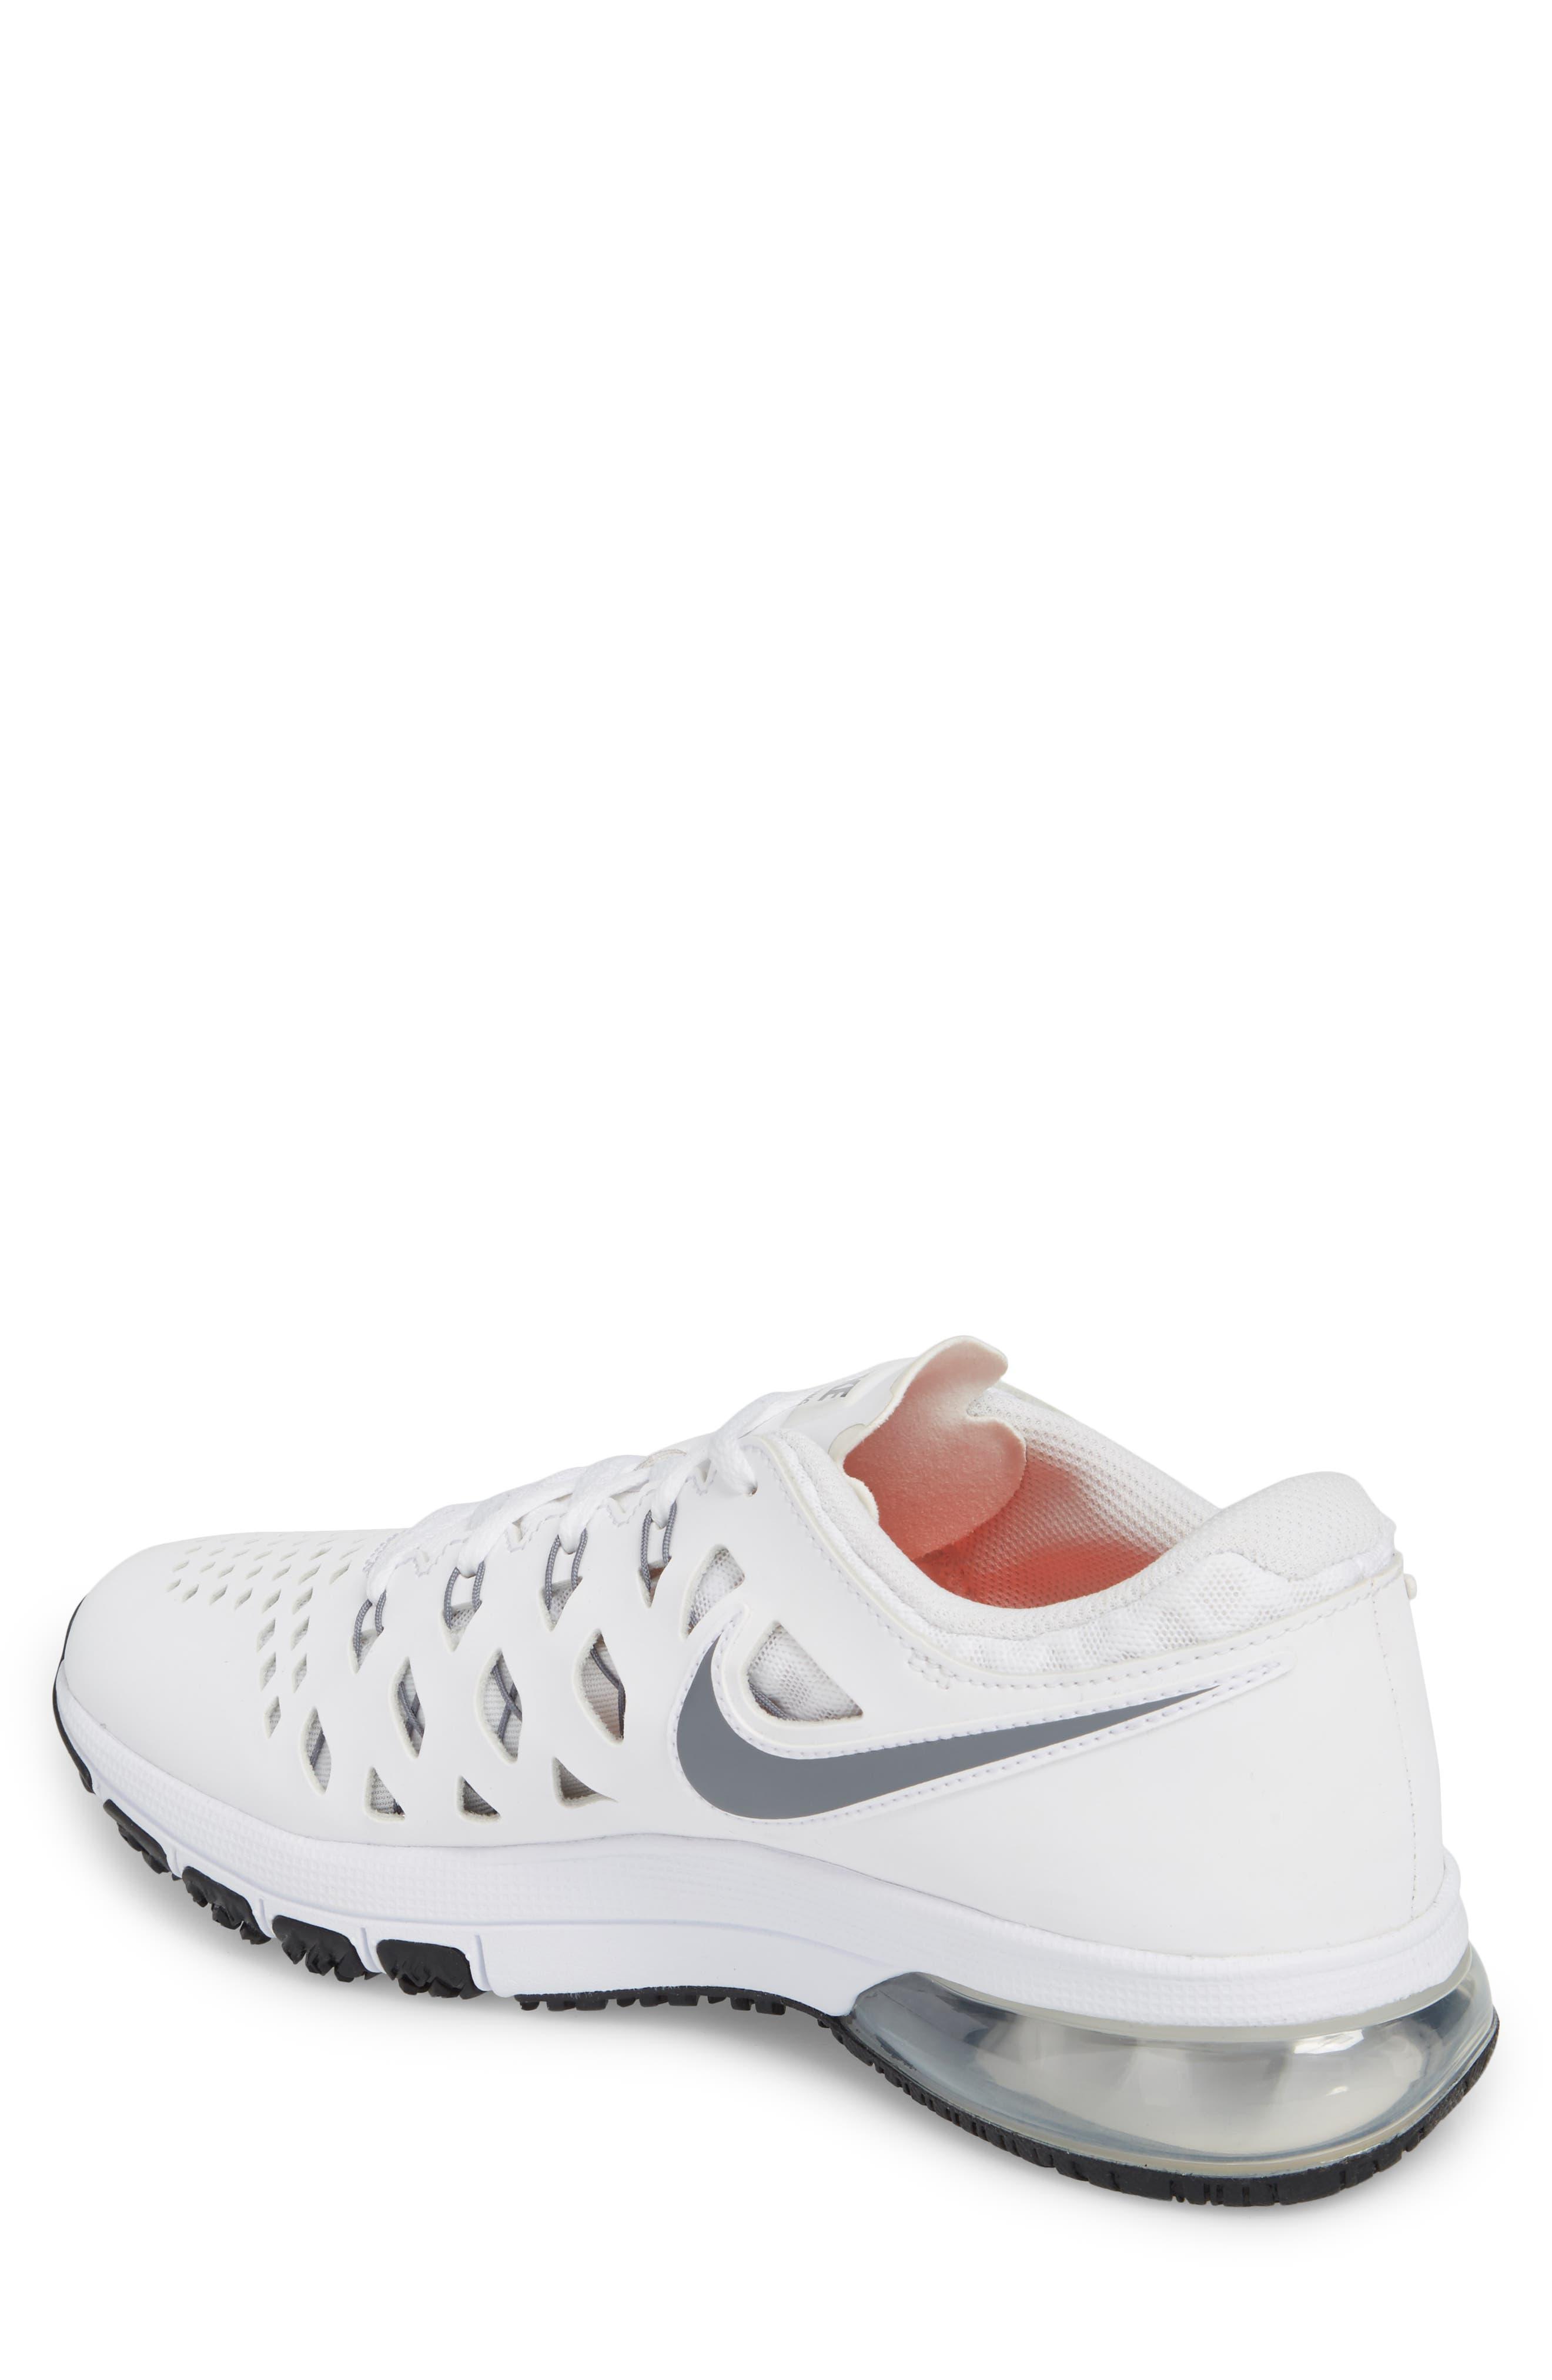 Air Trainer 180 Training Shoe,                             Alternate thumbnail 2, color,                             White/ Cool Grey-Black